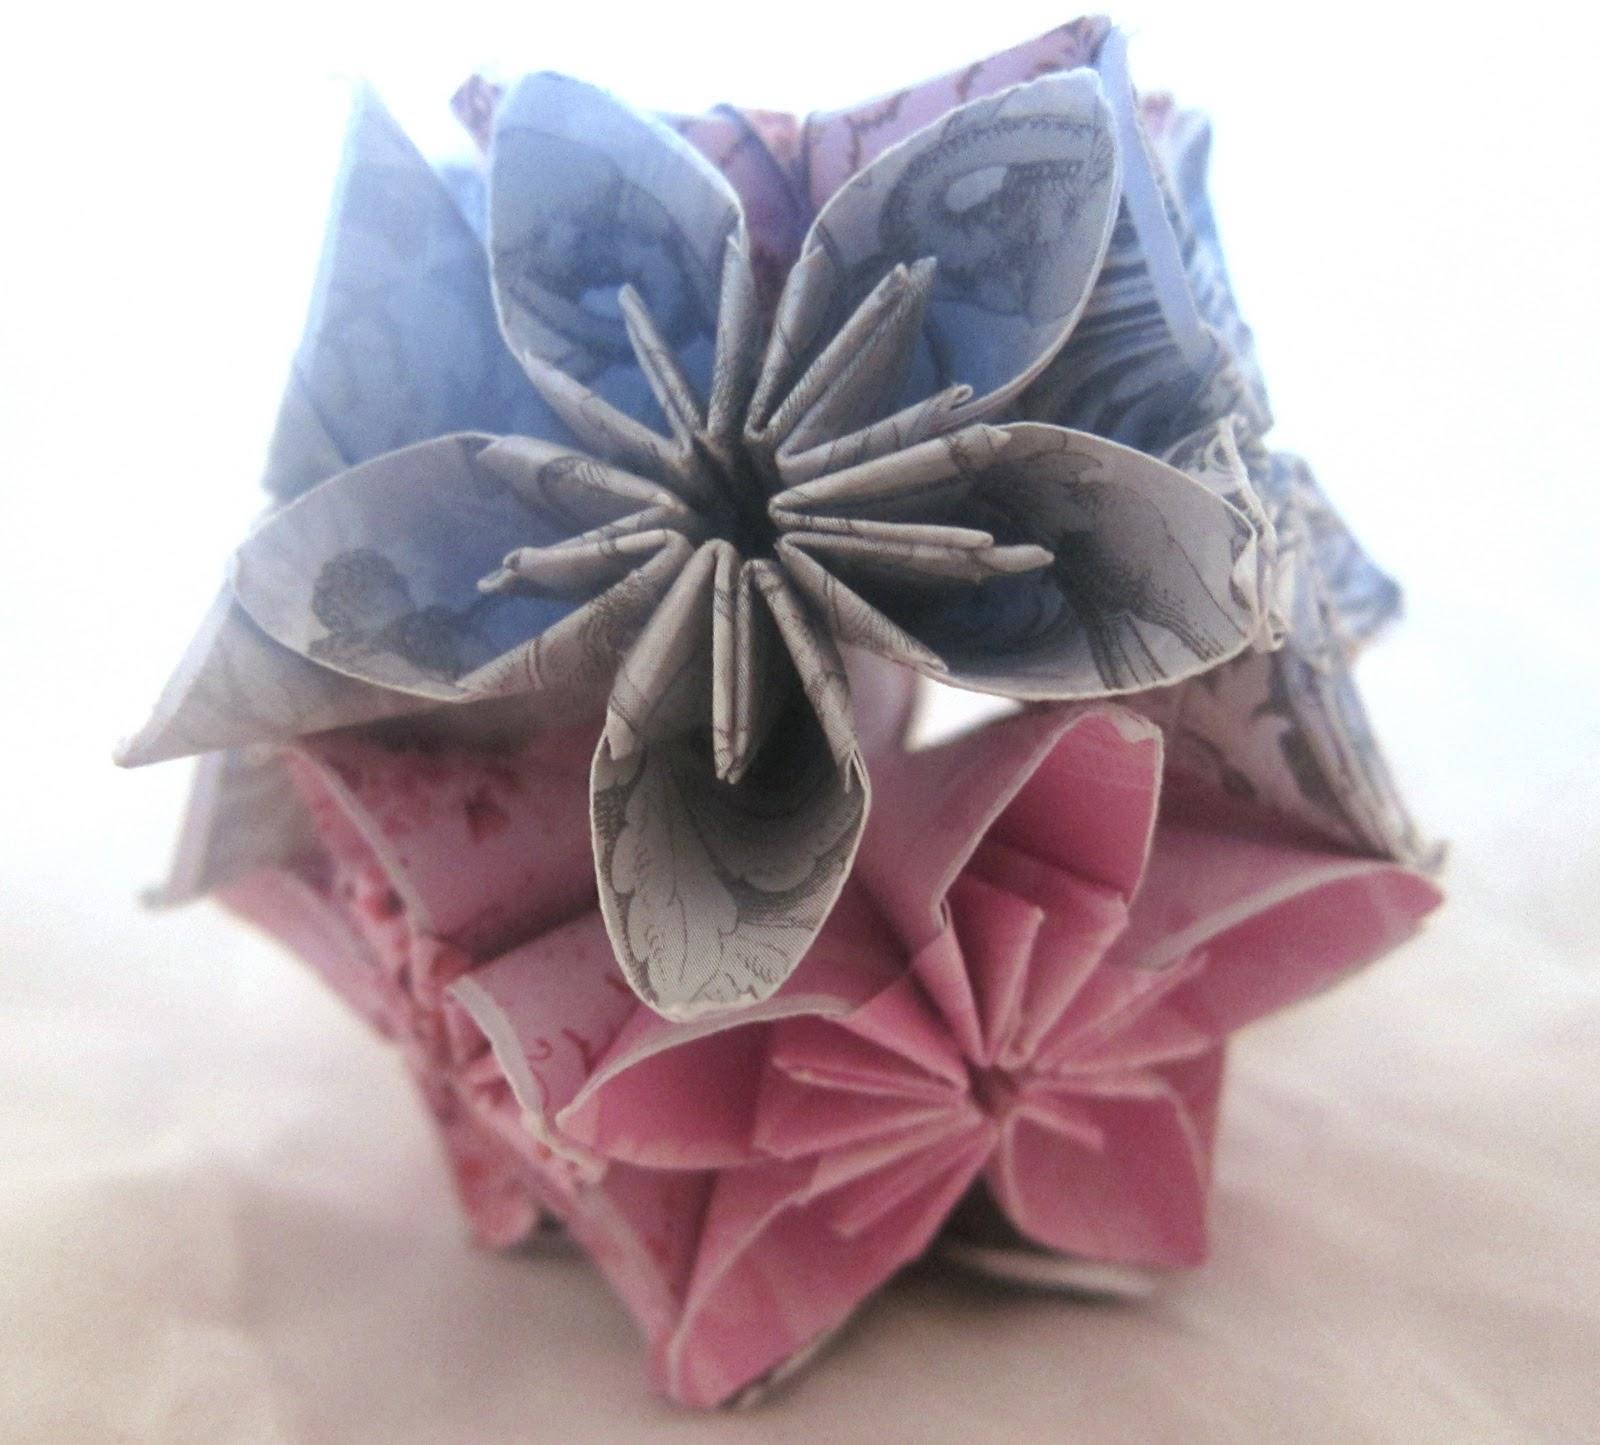 Beads Flowers Glue Paper Scissors Kusudama